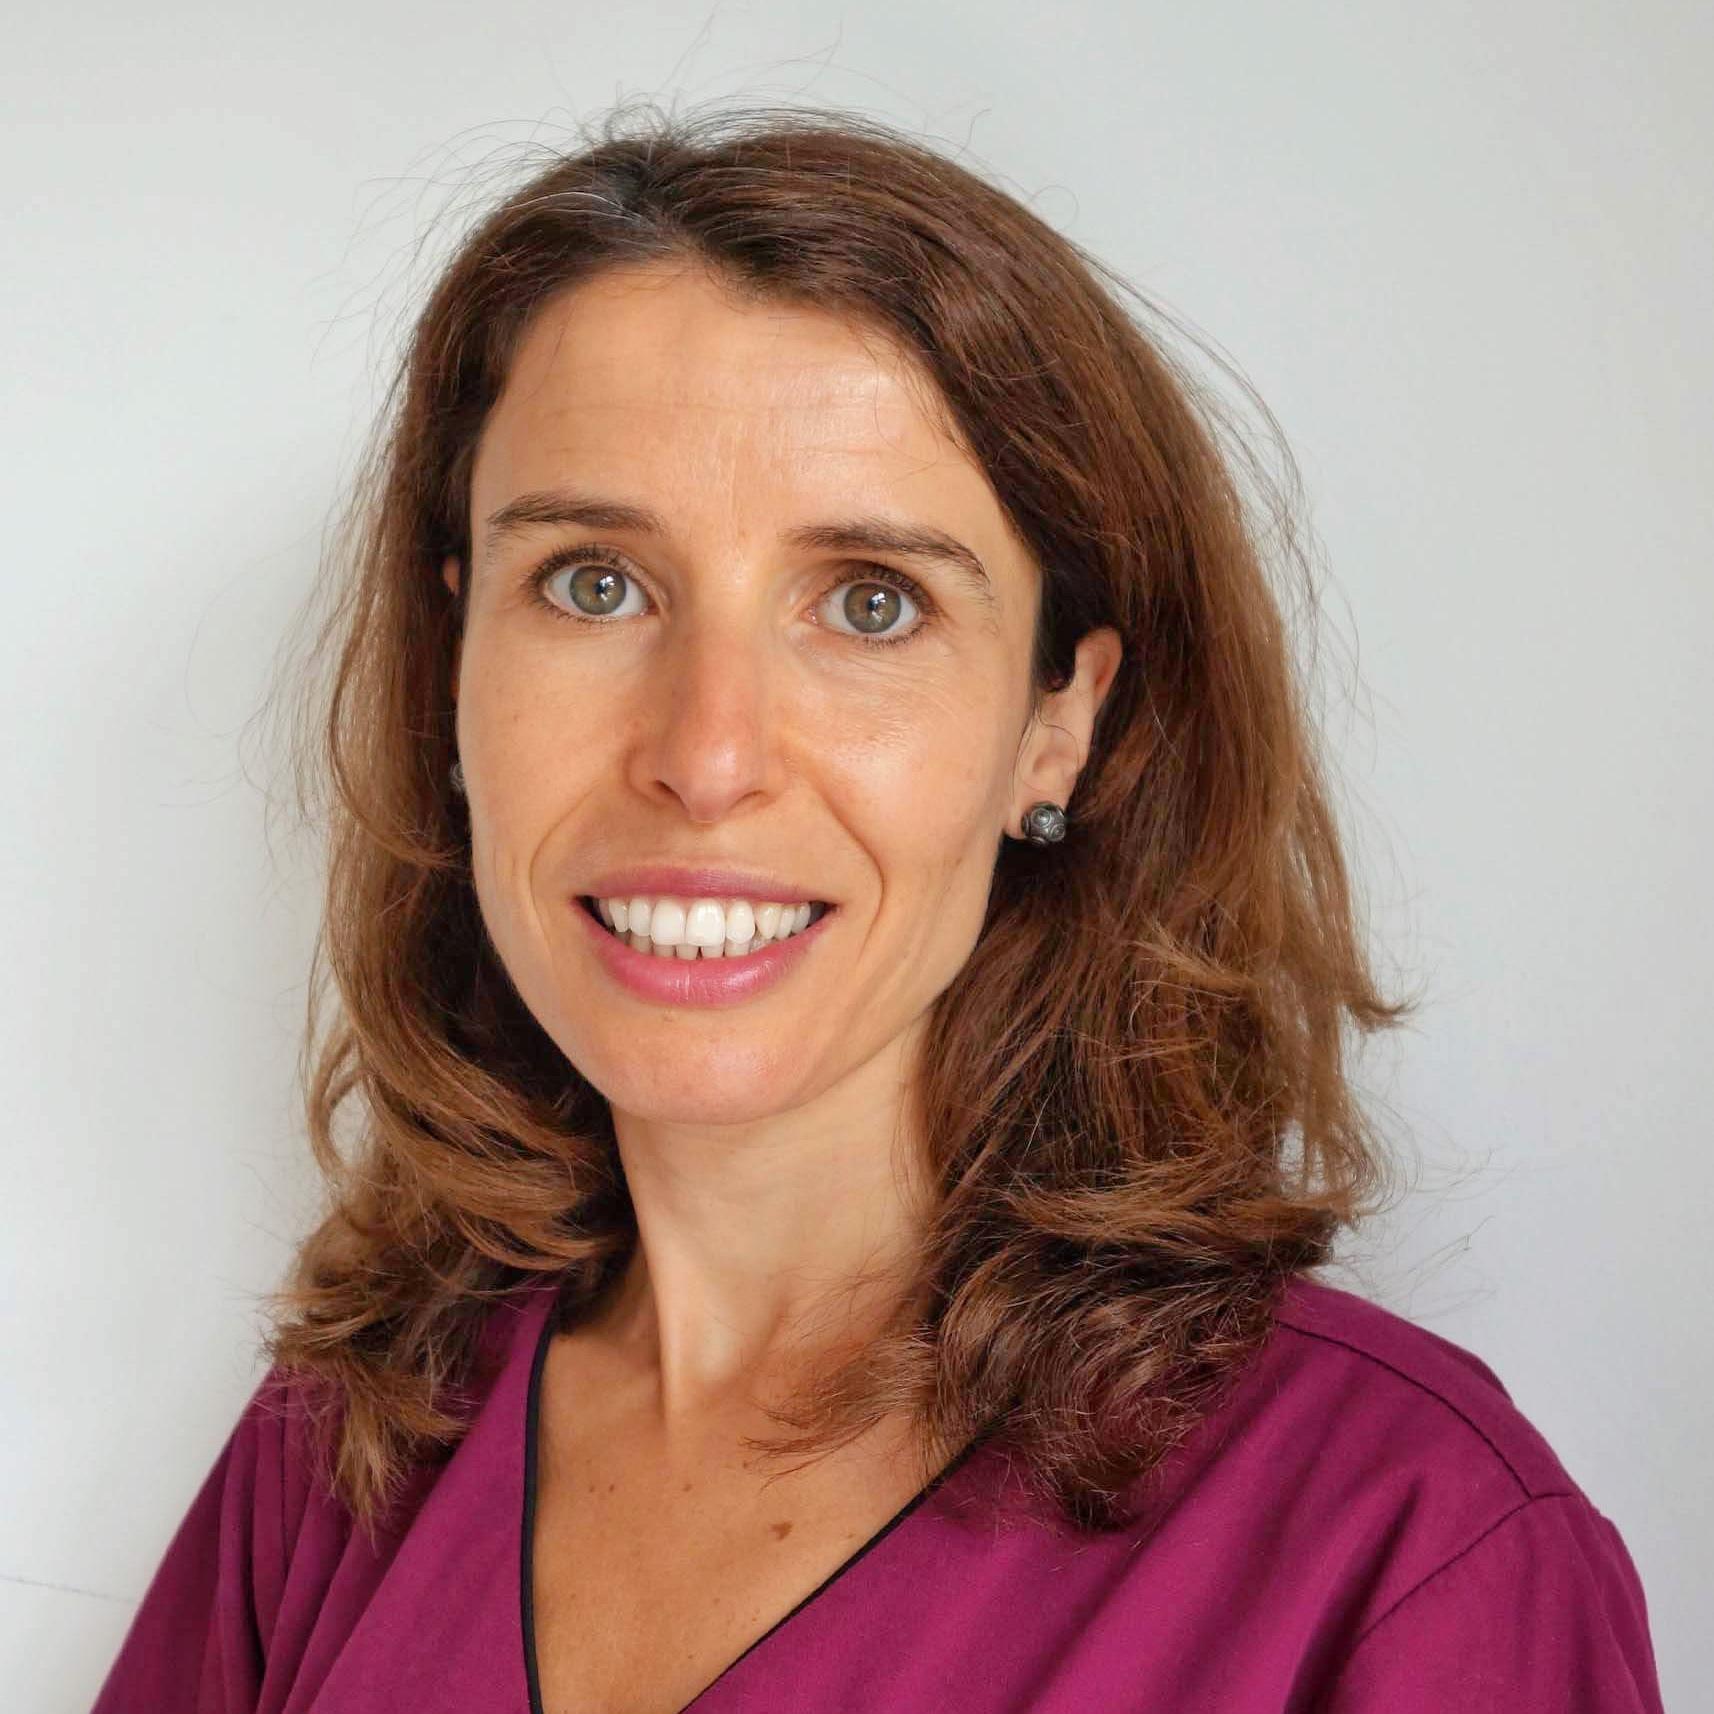 Ana Sousa Surwald LMD